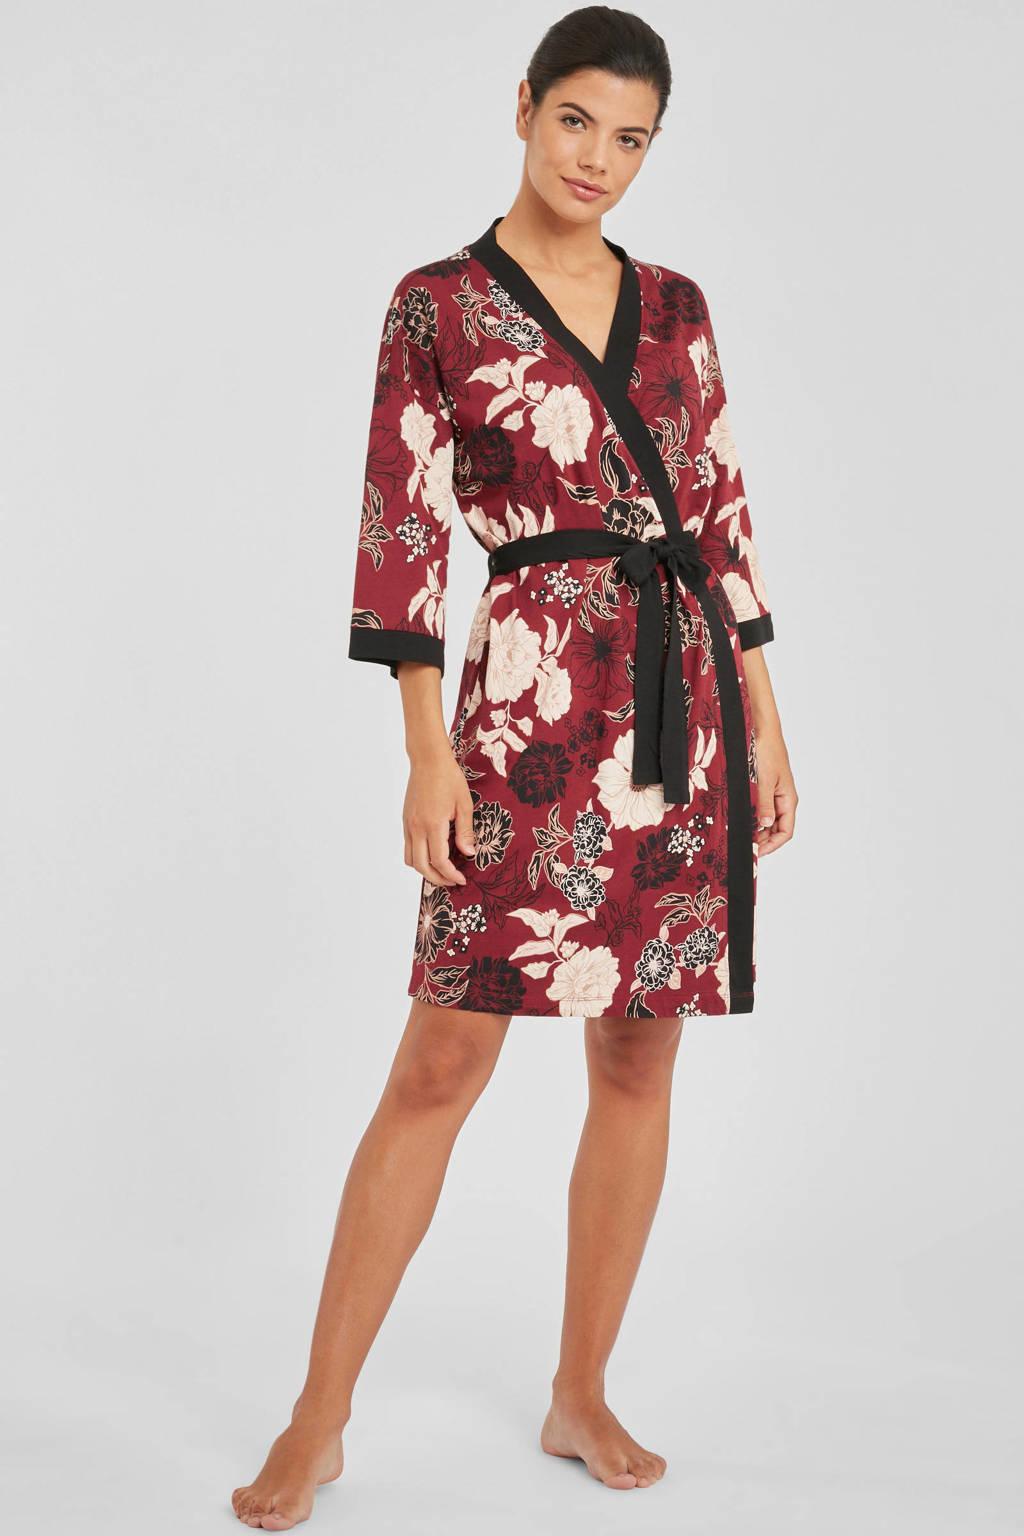 s.Oliver gebloemde kimono donkerrood/zwart, Donkerrood/zwart